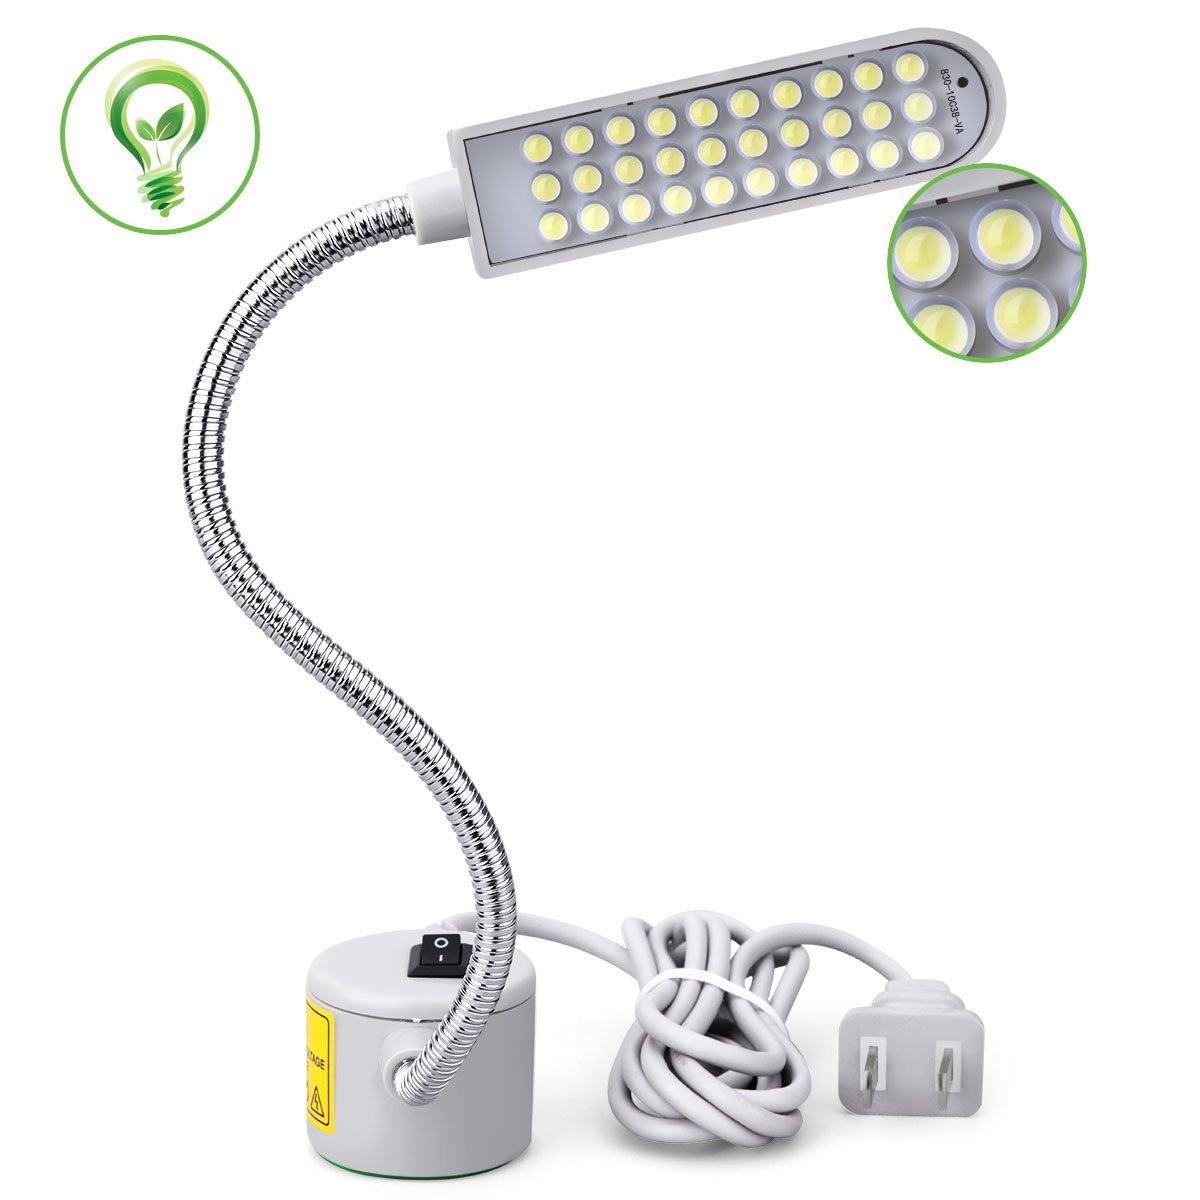 JANSANE Sewing Machine Light LED Lighting (30LEDs) 2 Watt Multifunctional Flexible Gooseneck Arm Work Lamp with Magnetic Mounting Base for Workbench Lathe Drill Press Silver